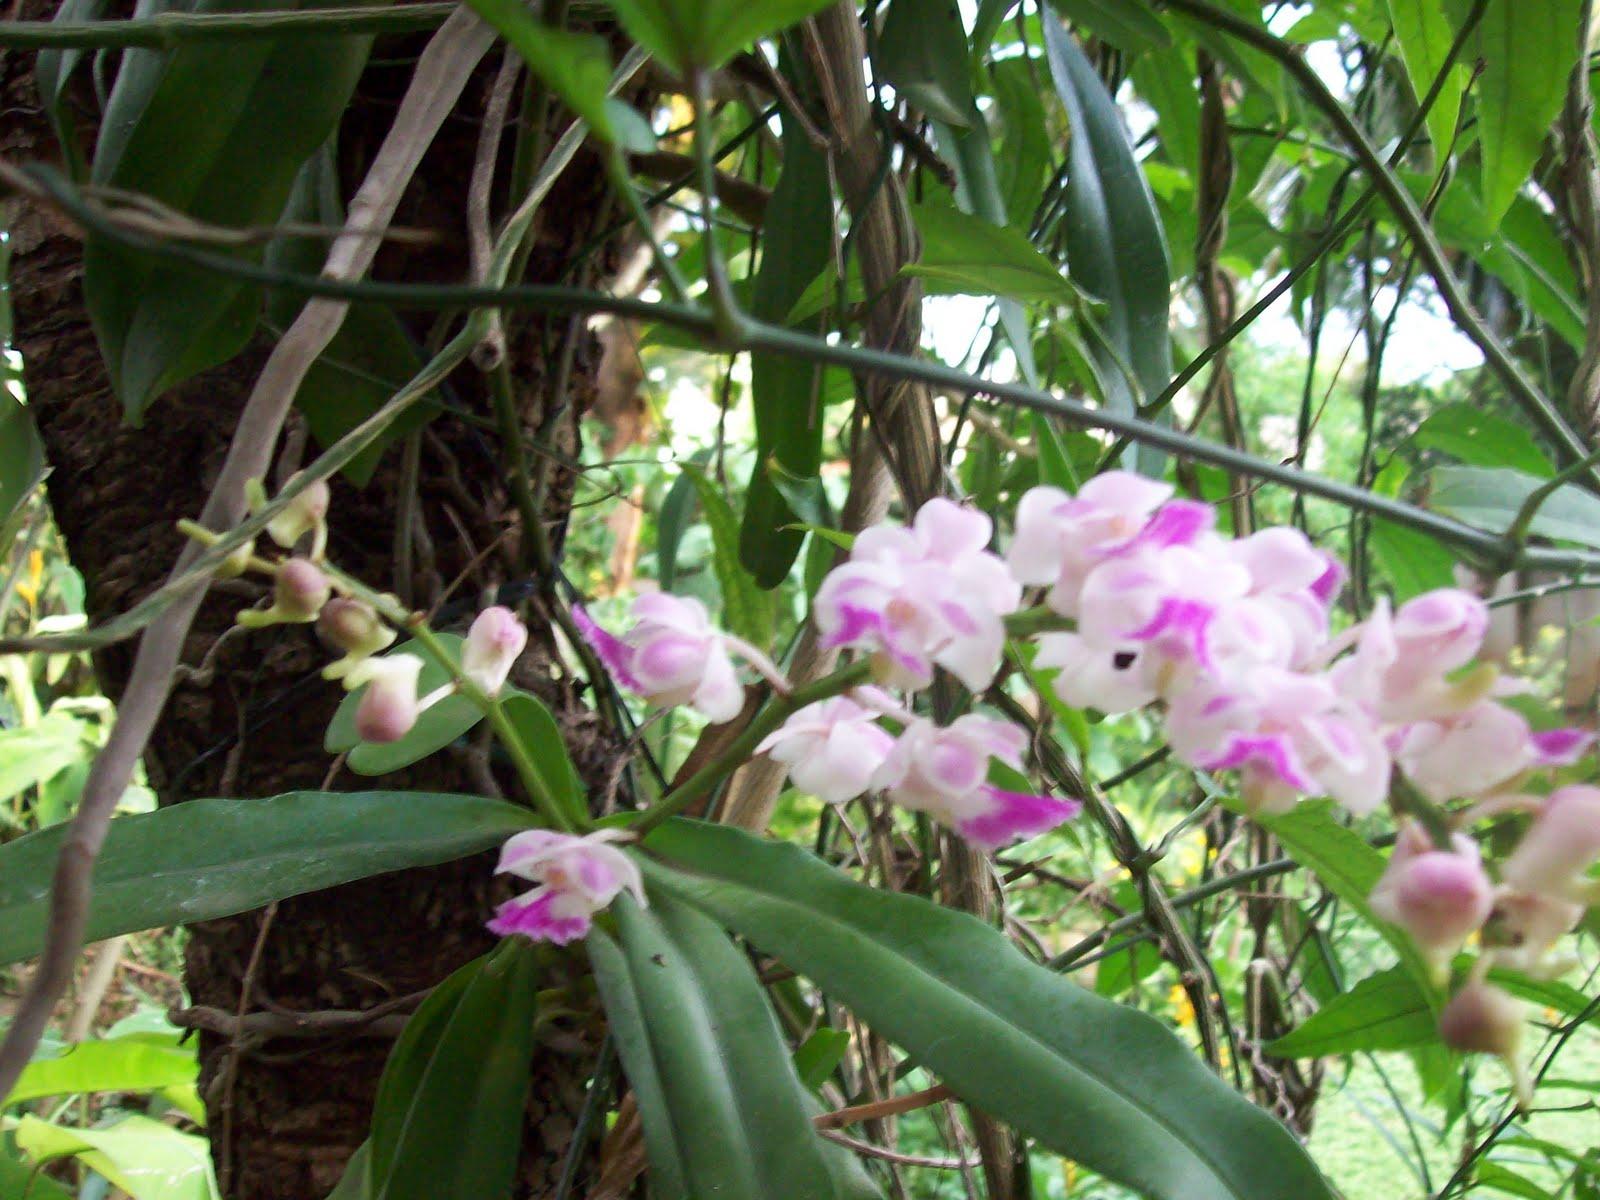 gardentropics: Wild Orchid